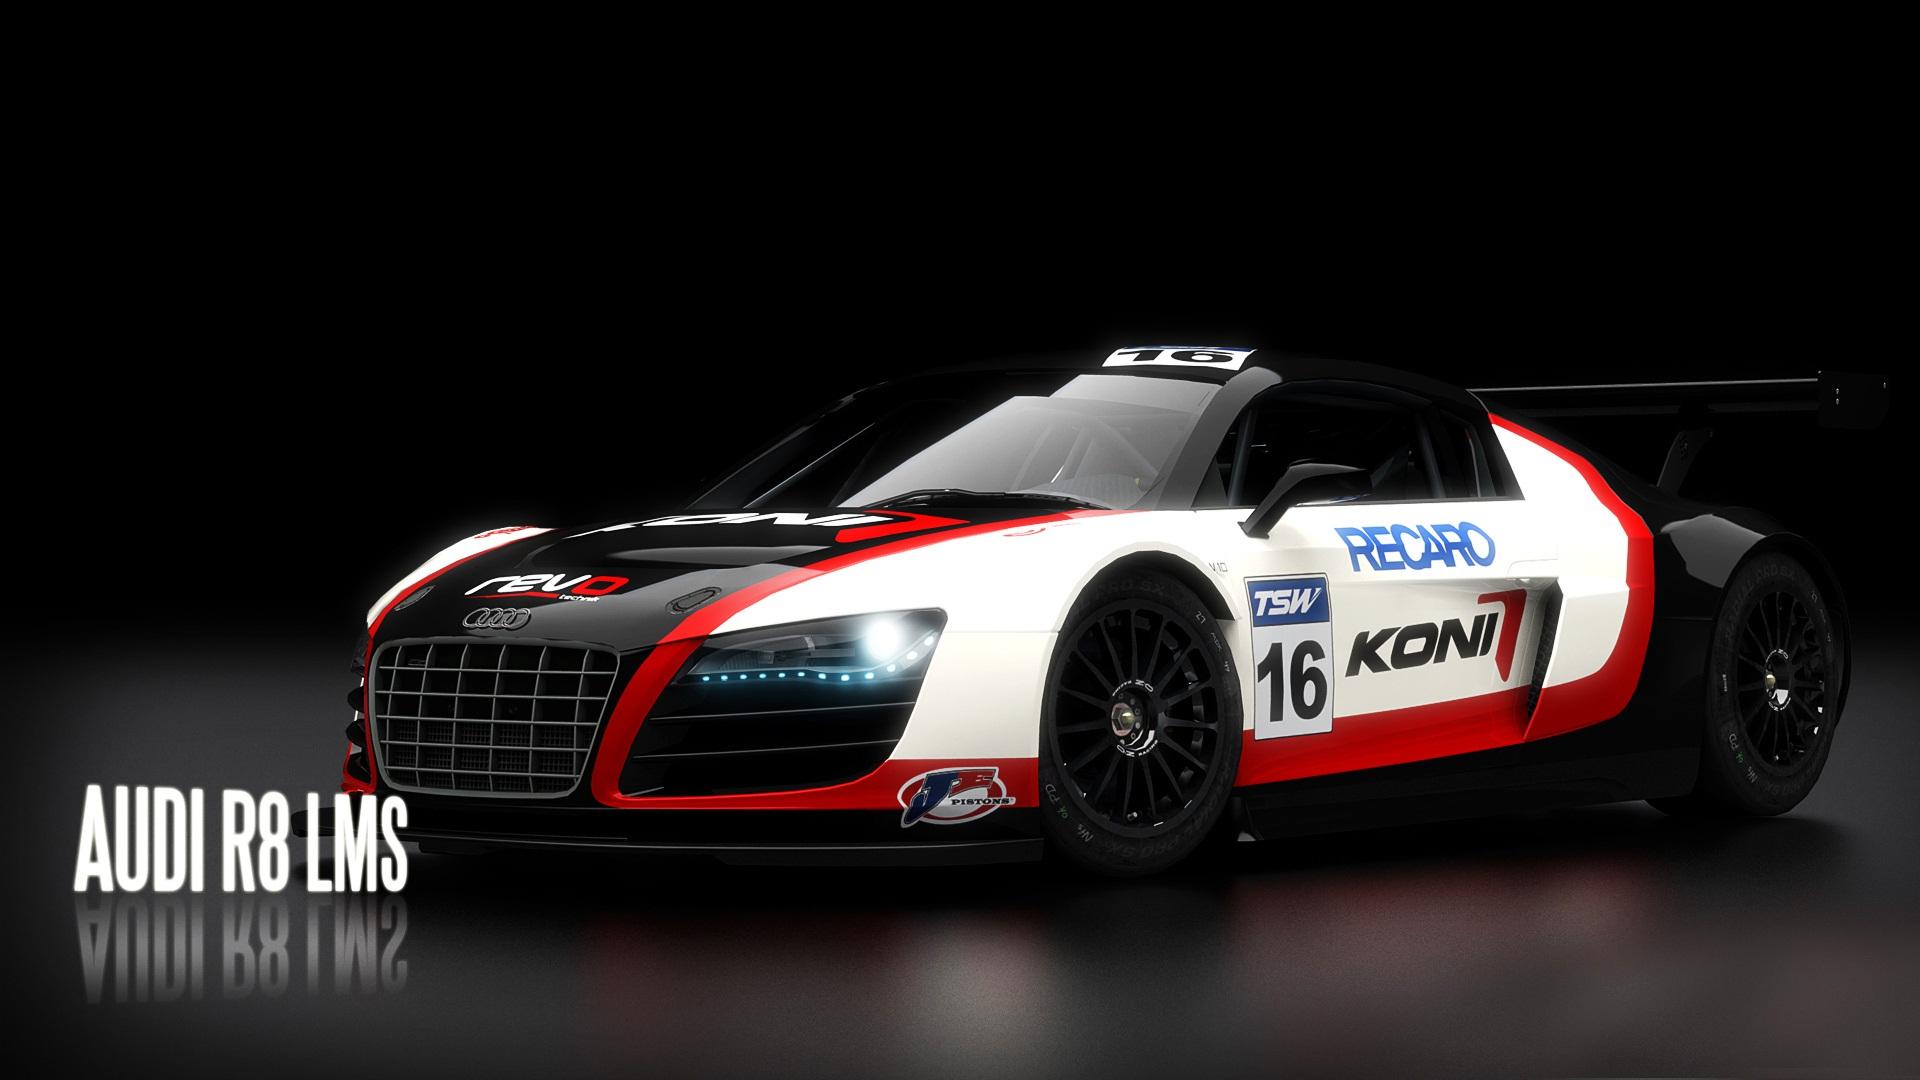 Download Racing Audi R8 LMS Wallpaper For Desktop Unique HD 1920x1080